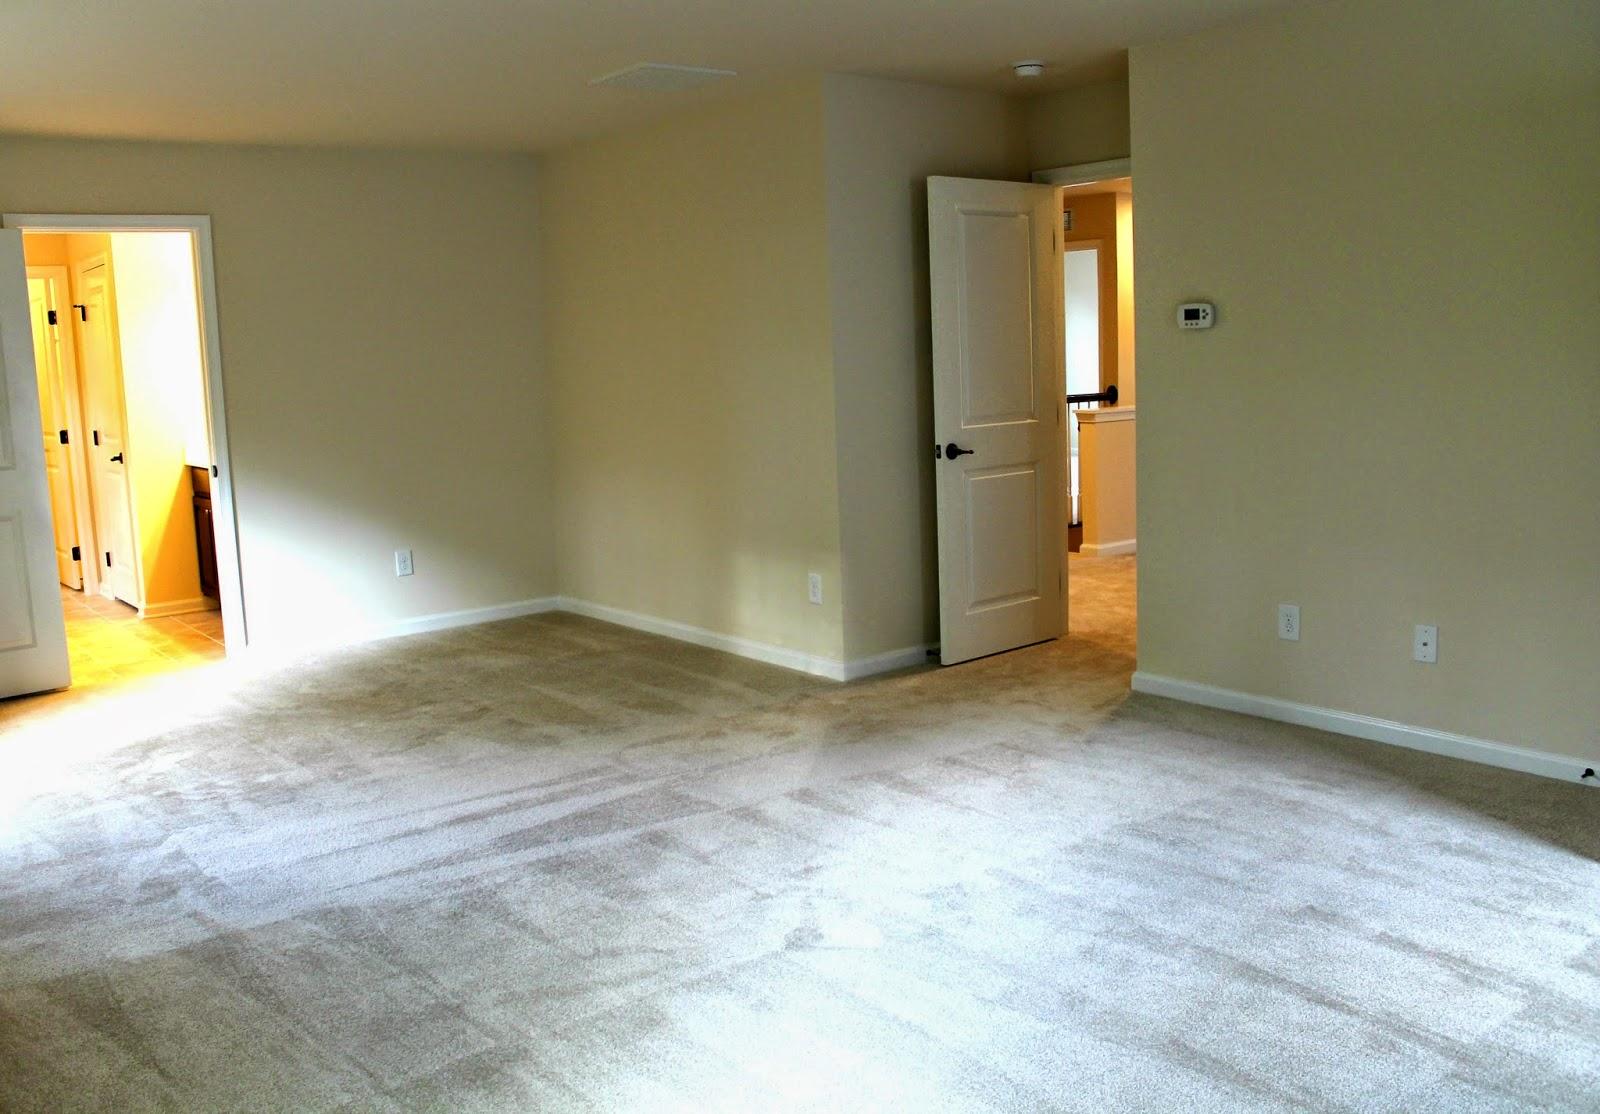 ryan homes naples master bedroom sitting area